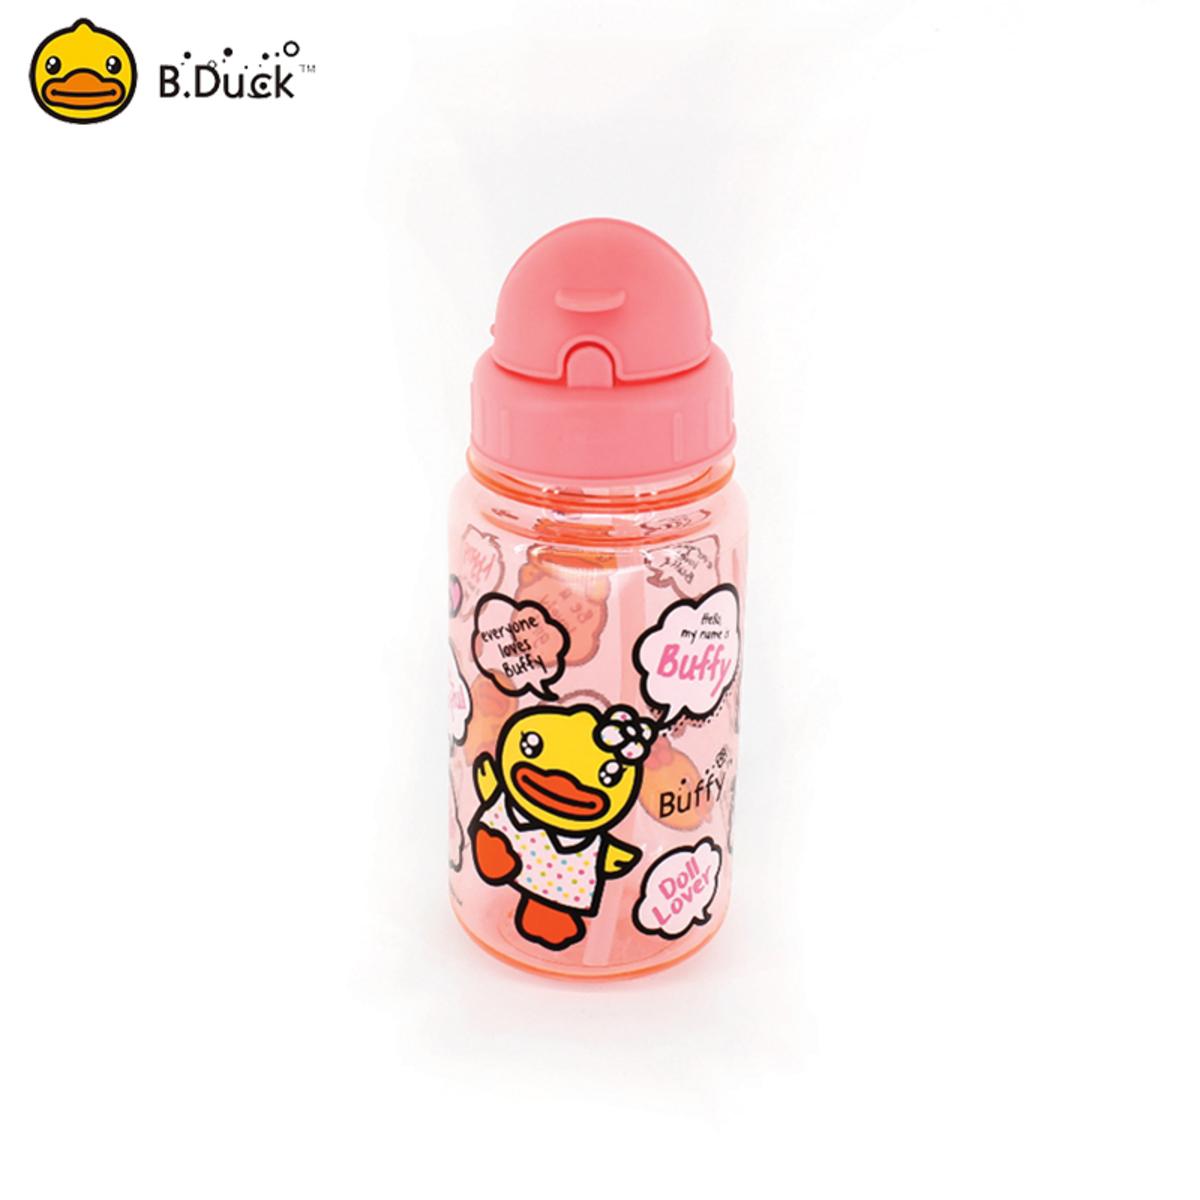 B.Duck Buffy 小鴨妹妹運動水樽 (350ml) Sport Bottle